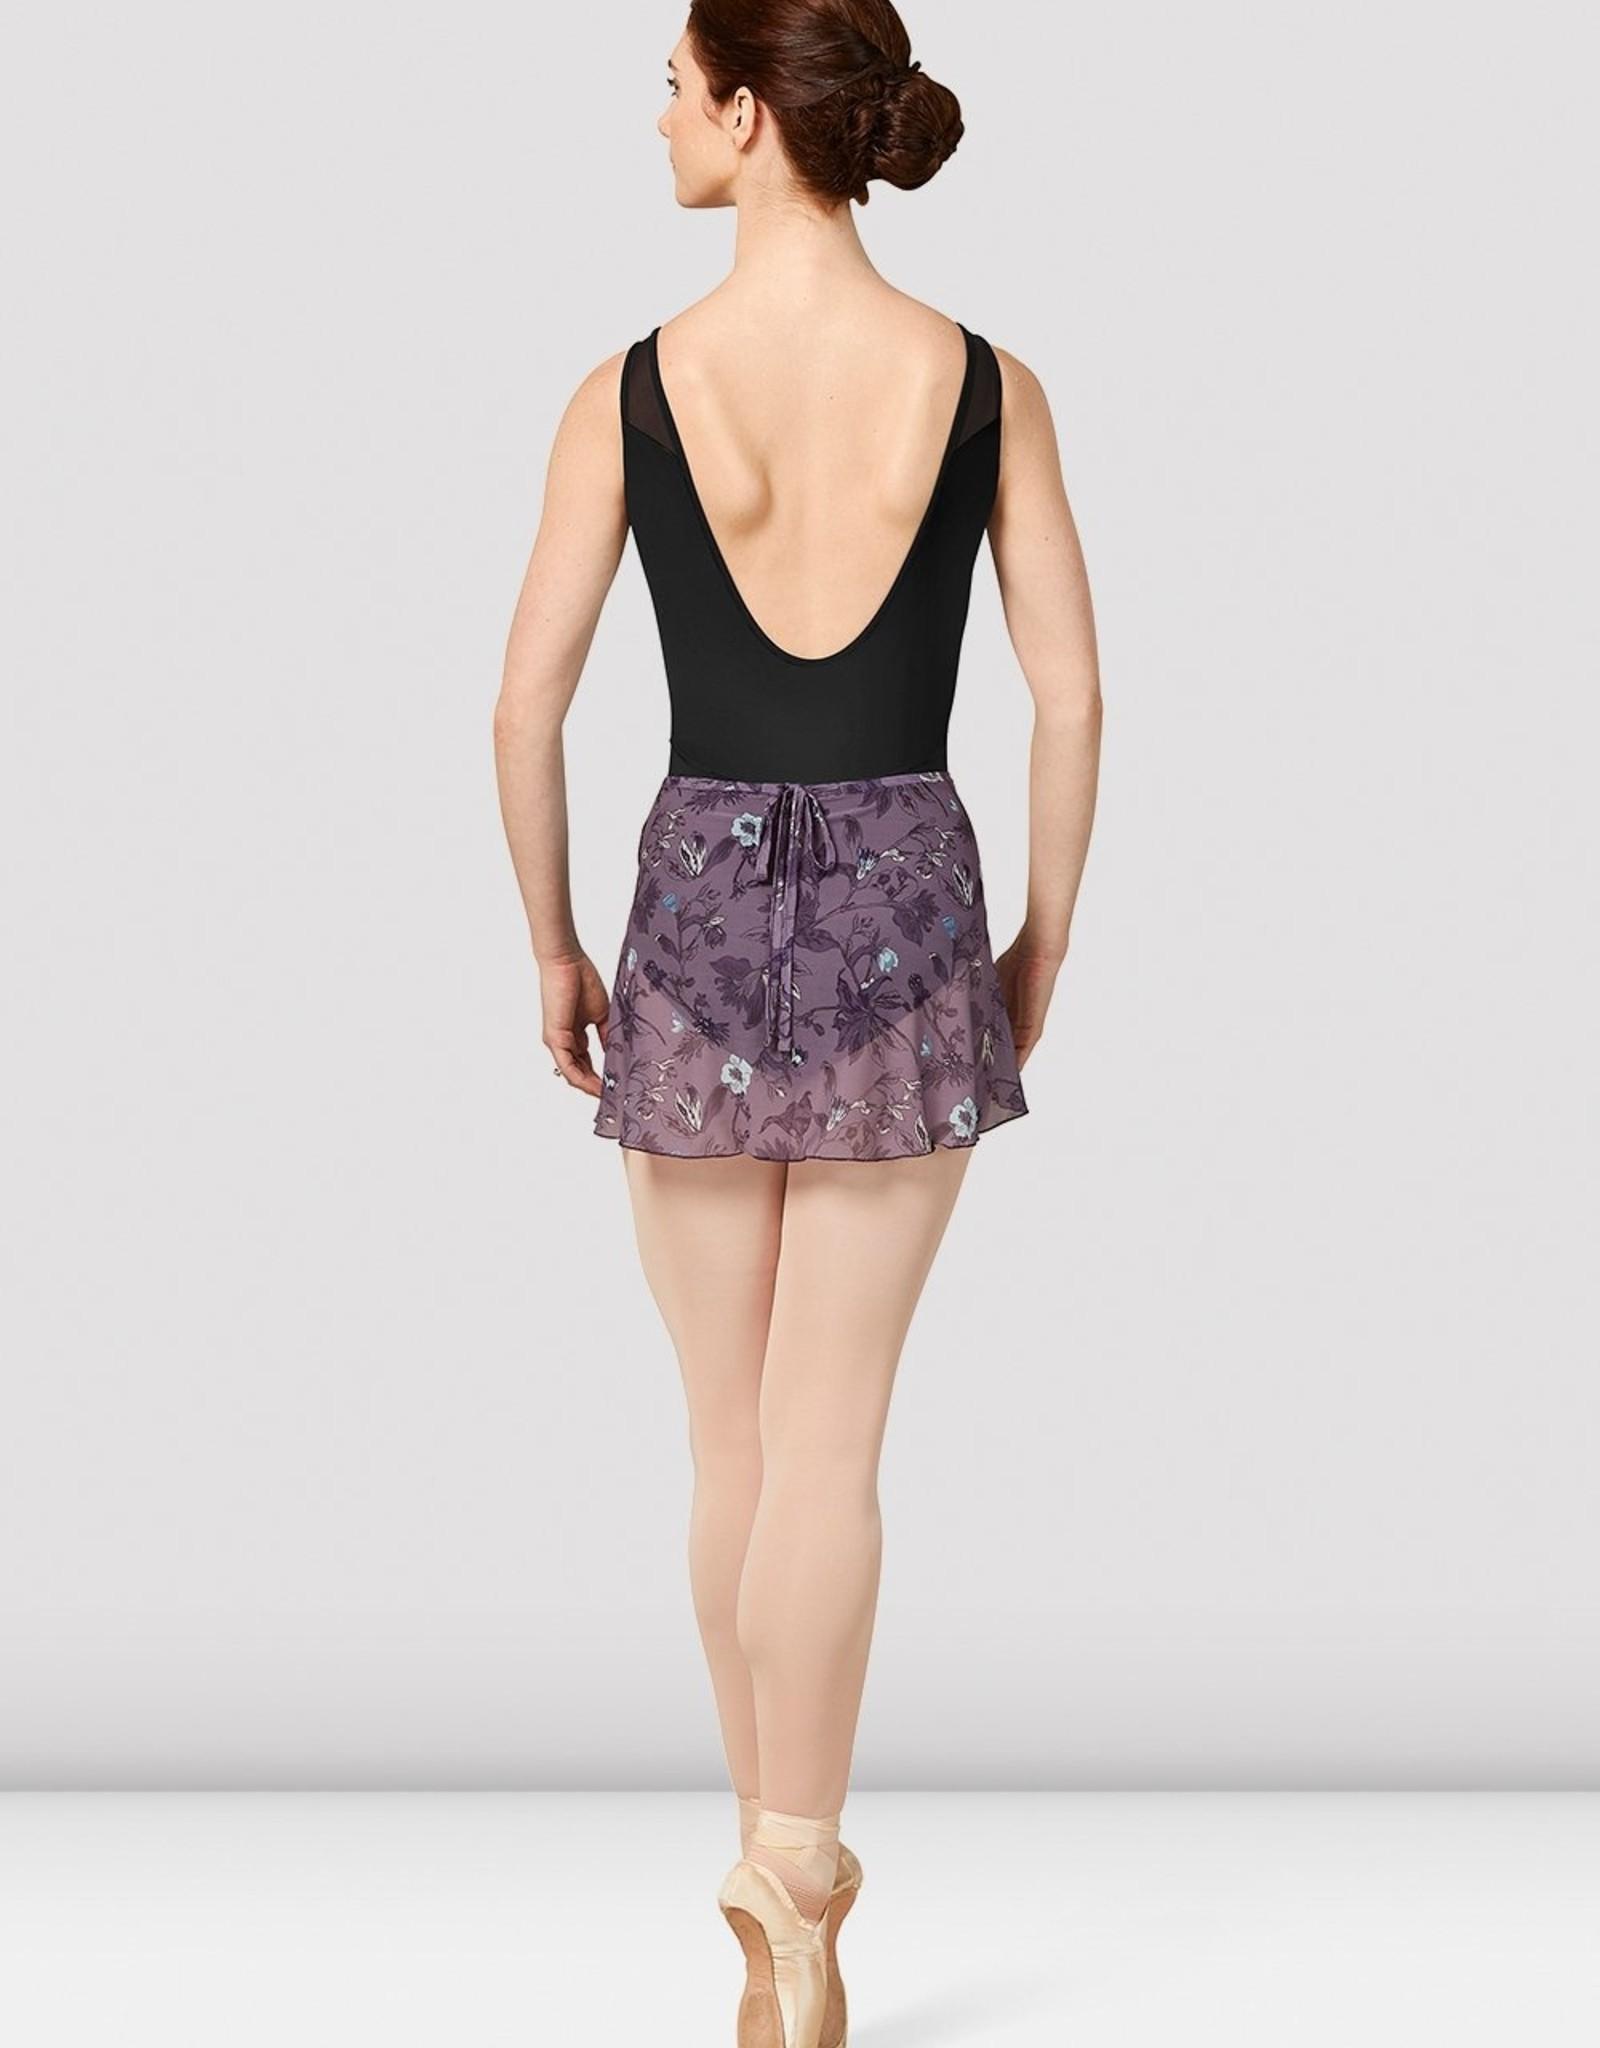 Bloch Bloch Printed Mesh Wrap Skirt - MS157